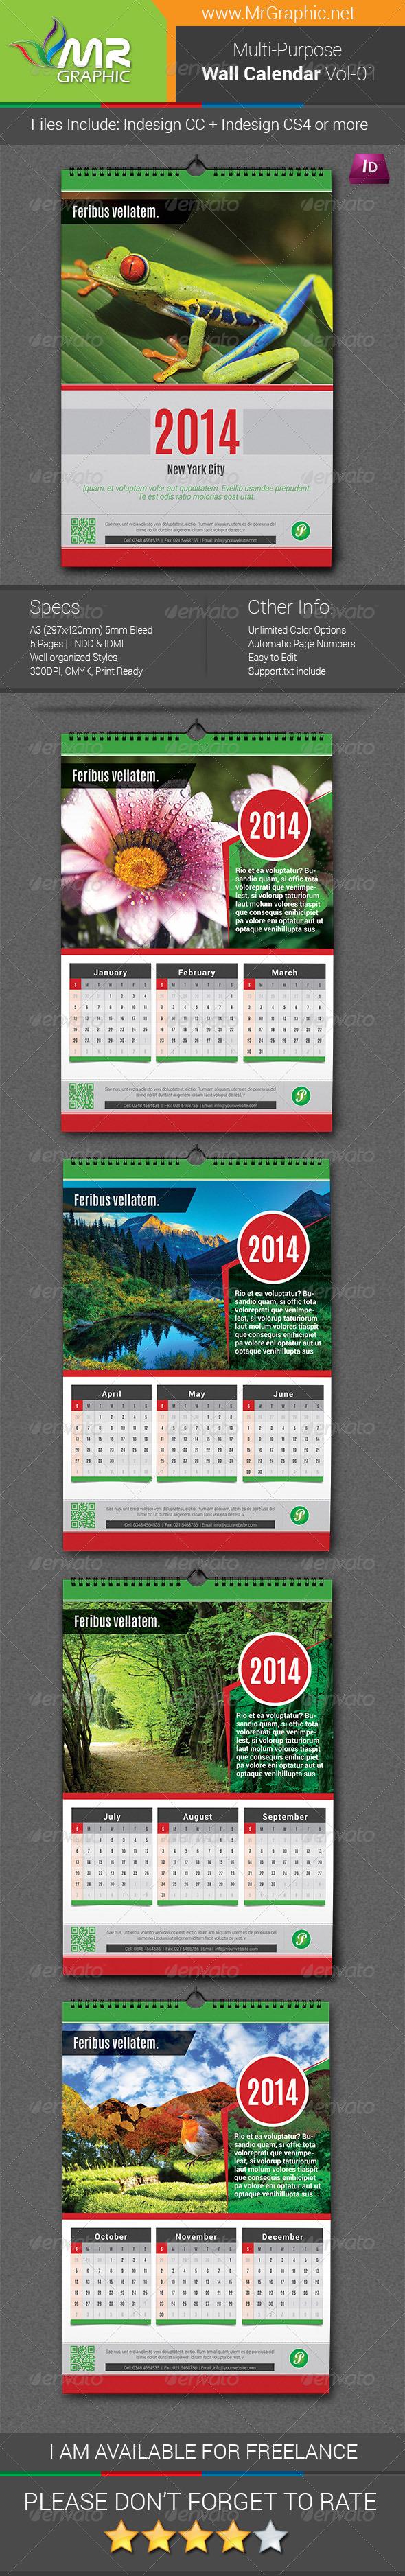 Wall Calendar Vol-1 - Calendars Stationery